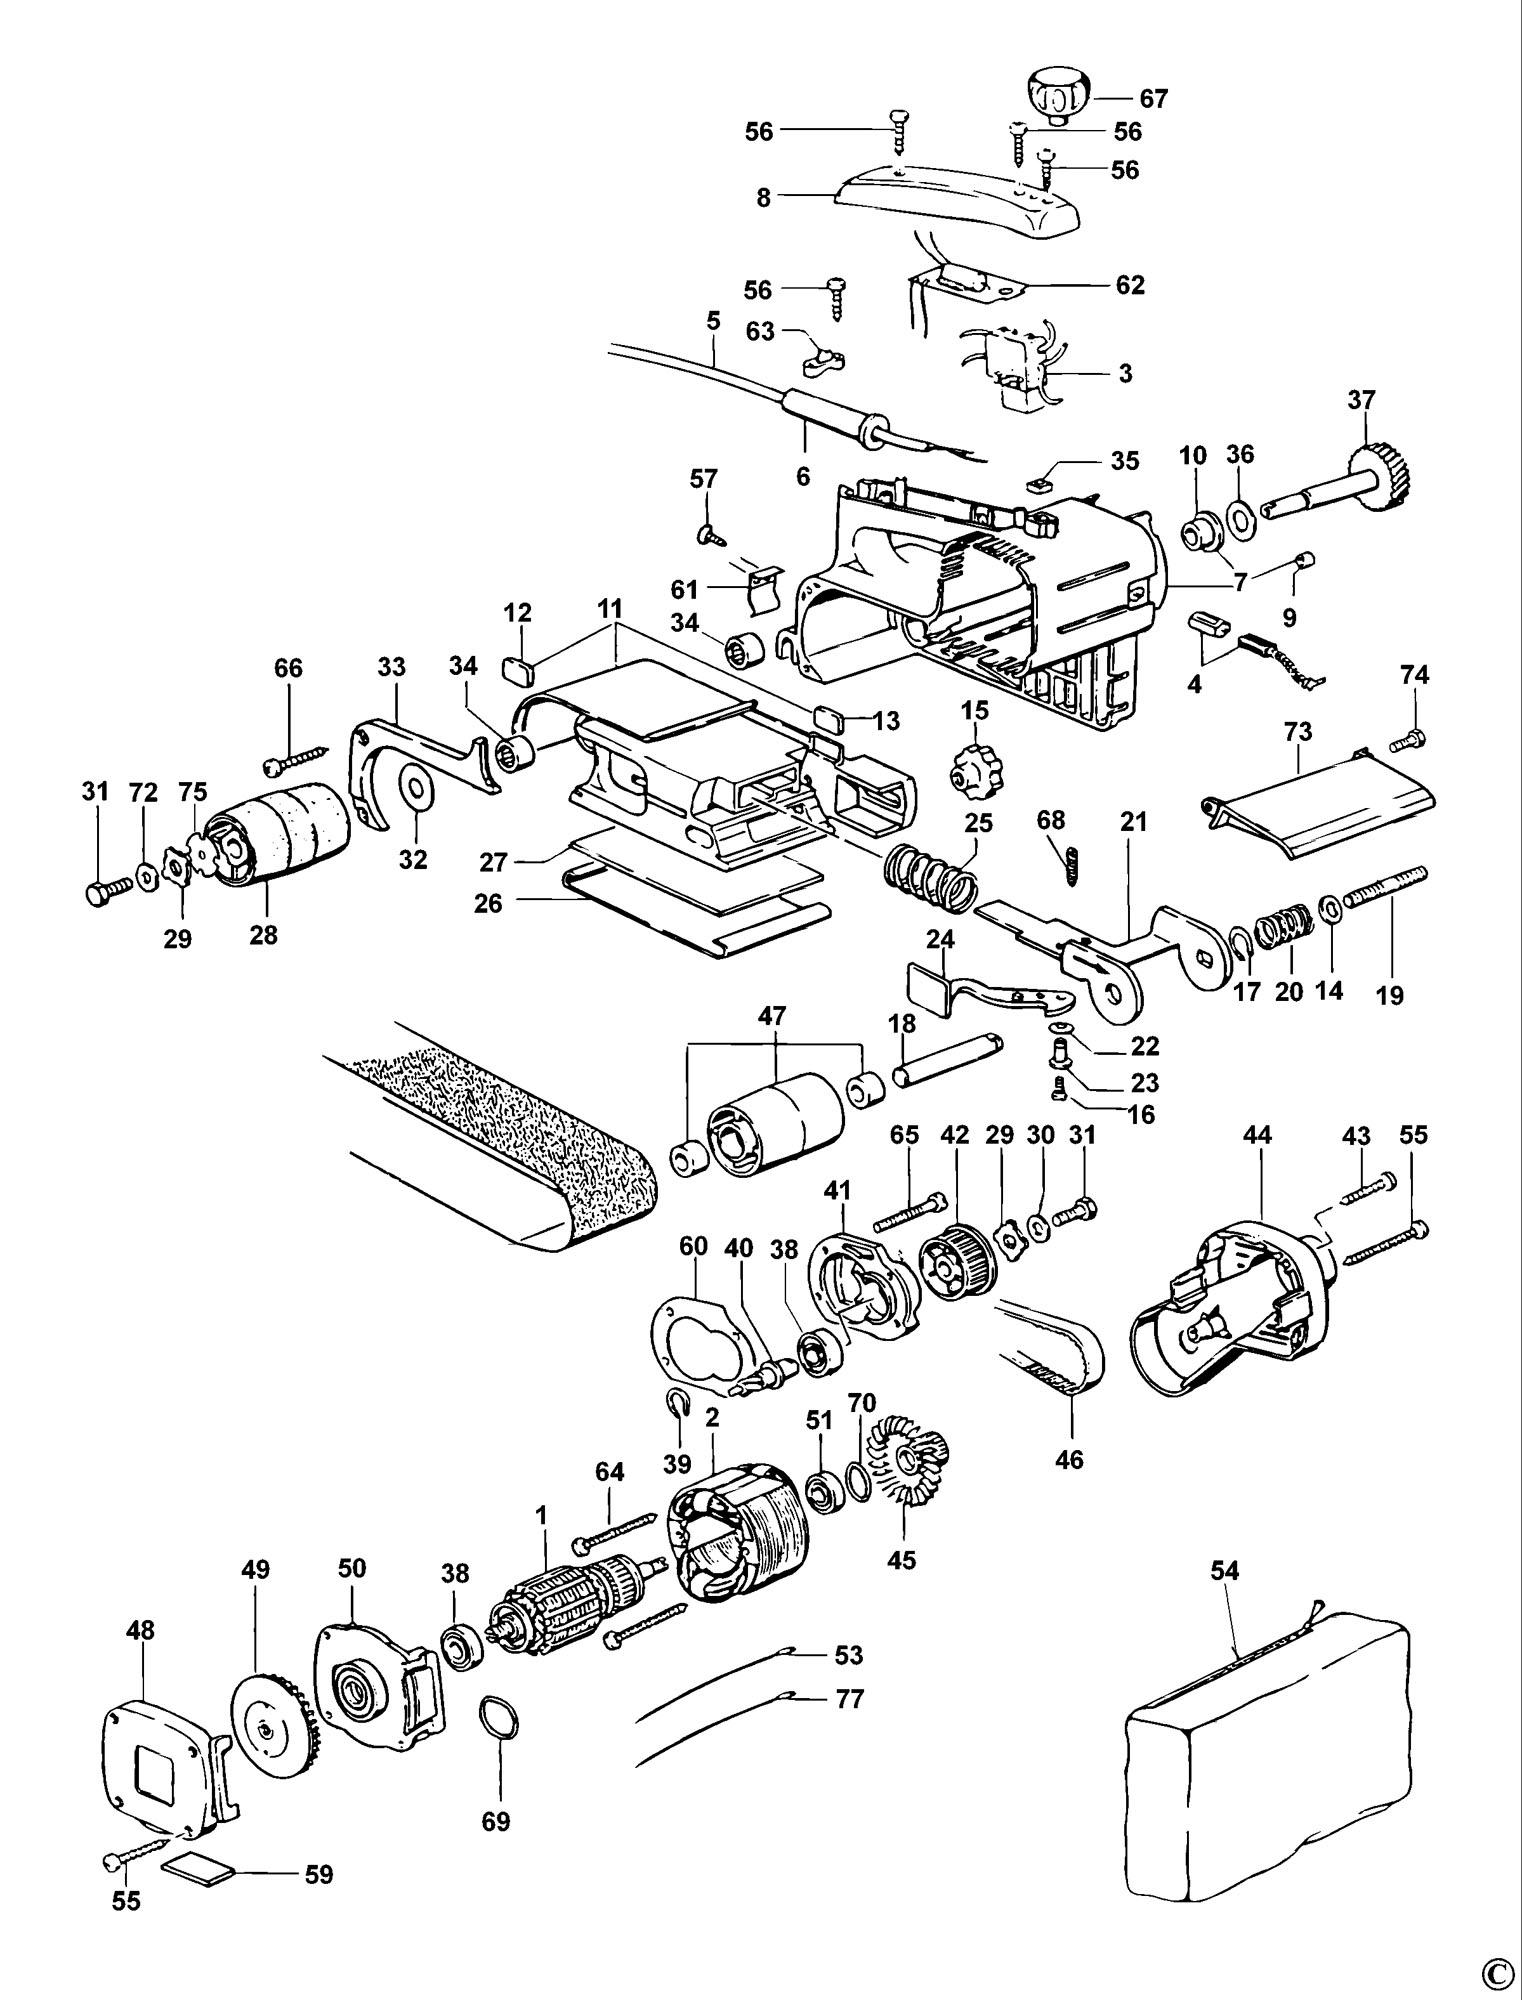 Spares for Elu Mhb157 Belt Sander (type 1) SPARE_MHB157